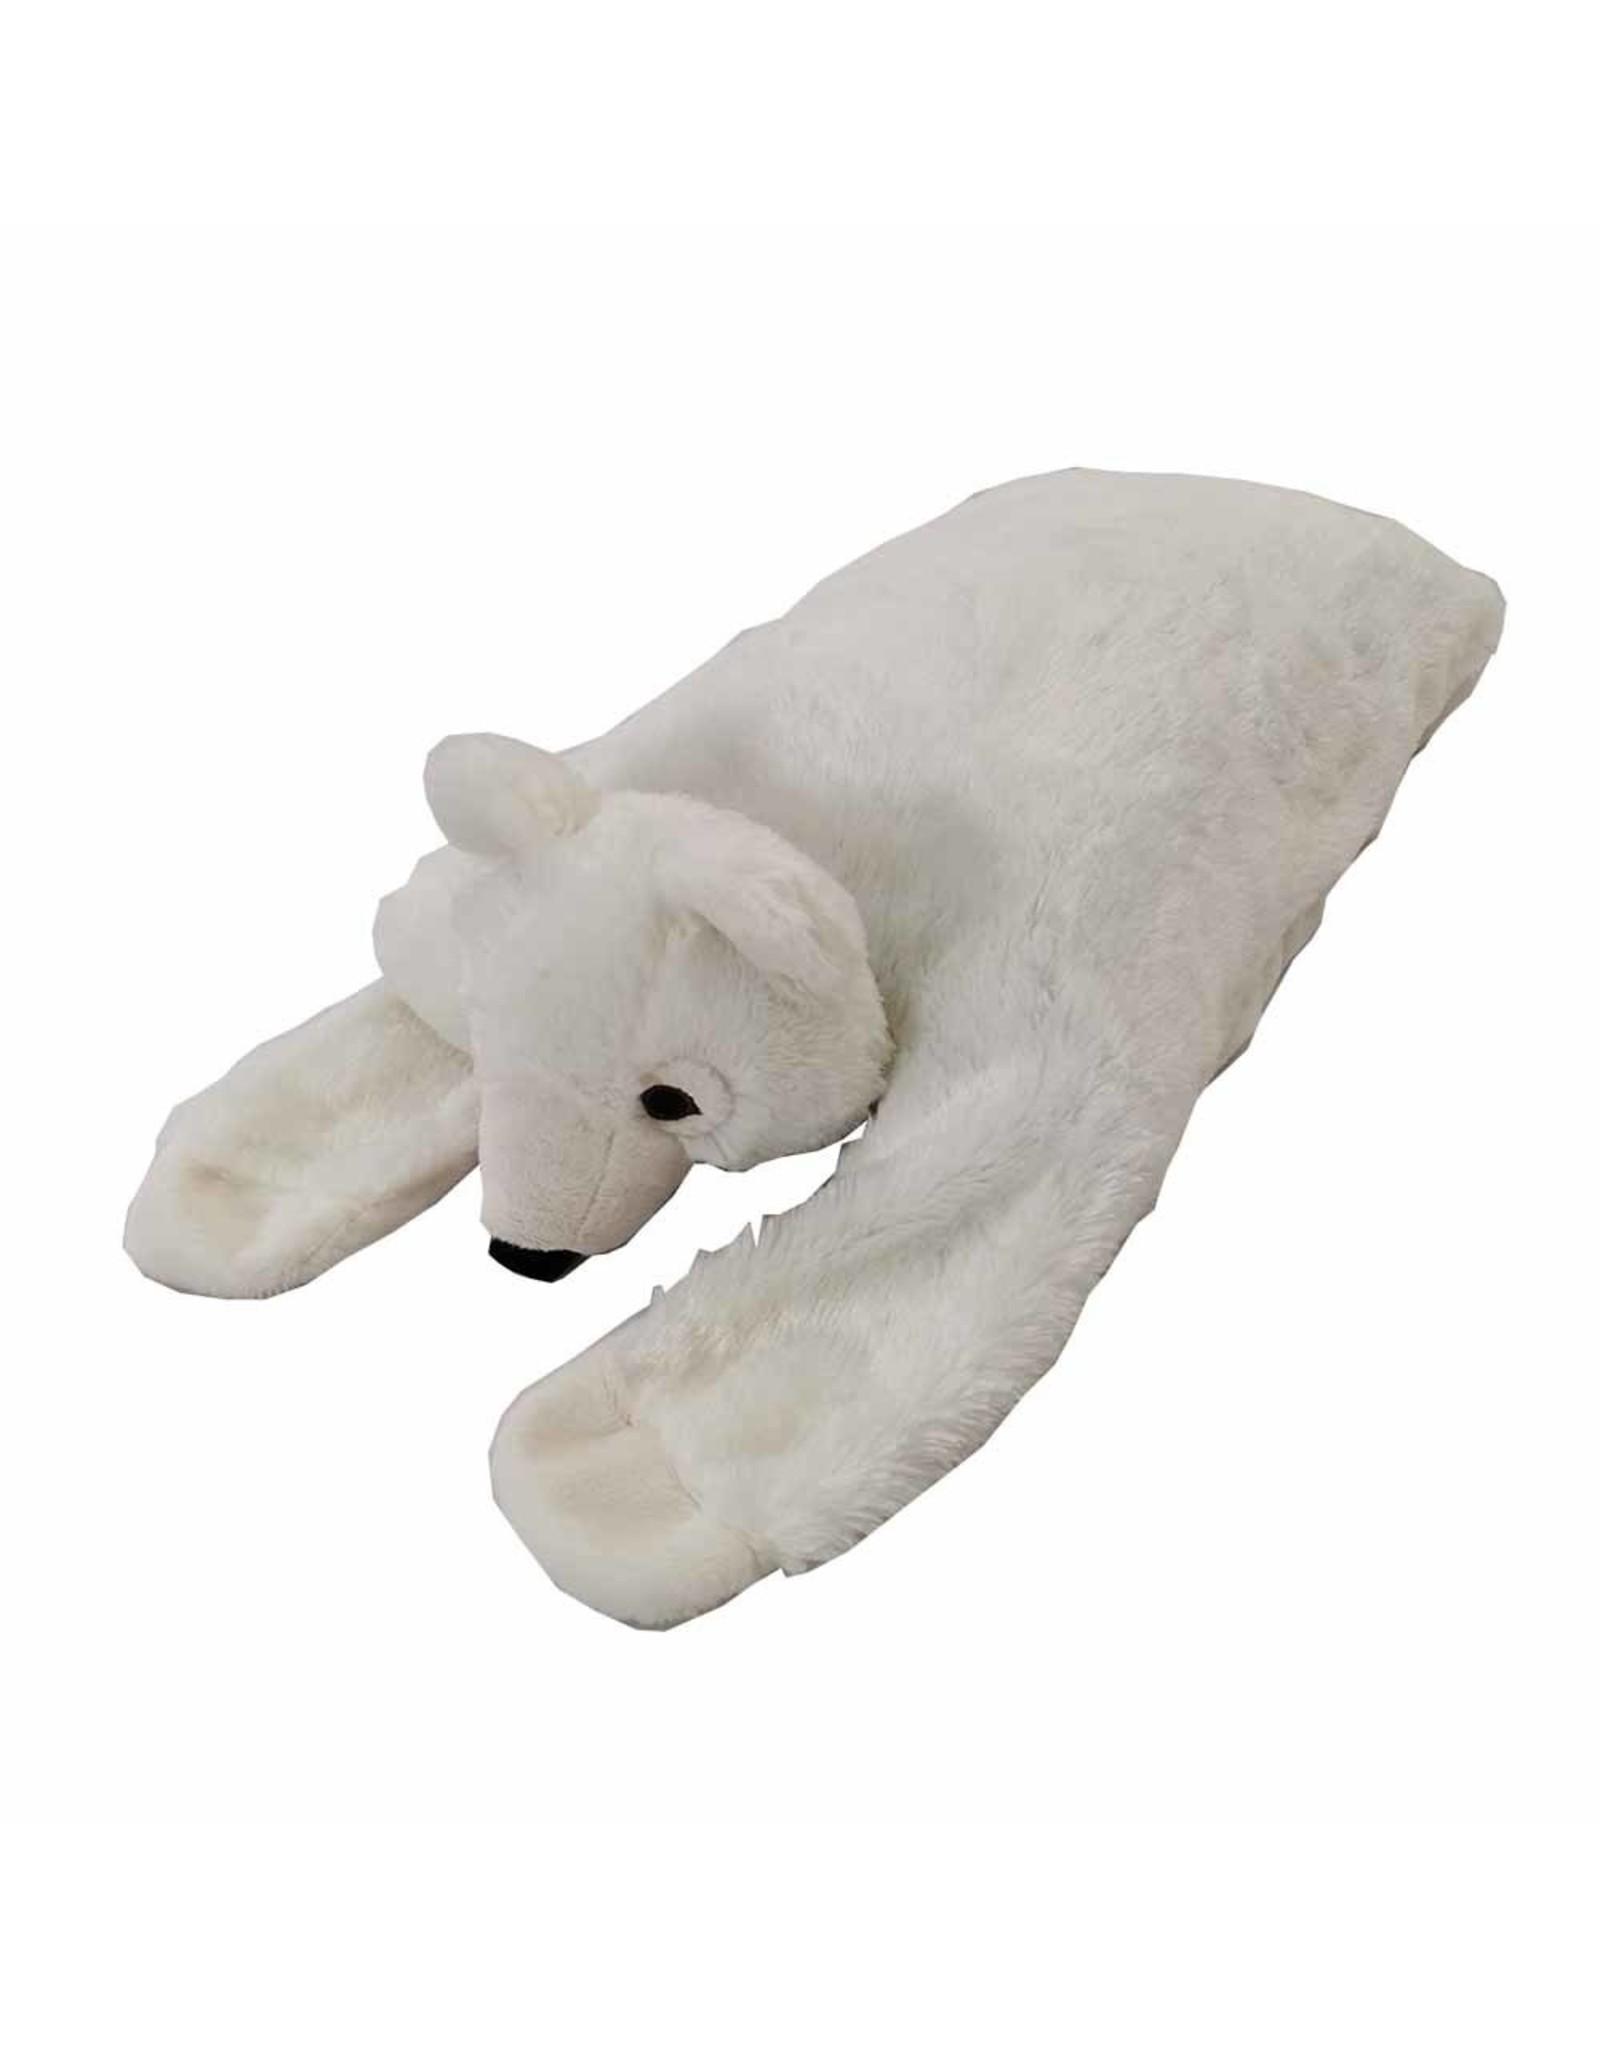 "FurSkinz FurSkin Blanket Bed - Polar Bear - 41"" x 19"" x 6.5"""